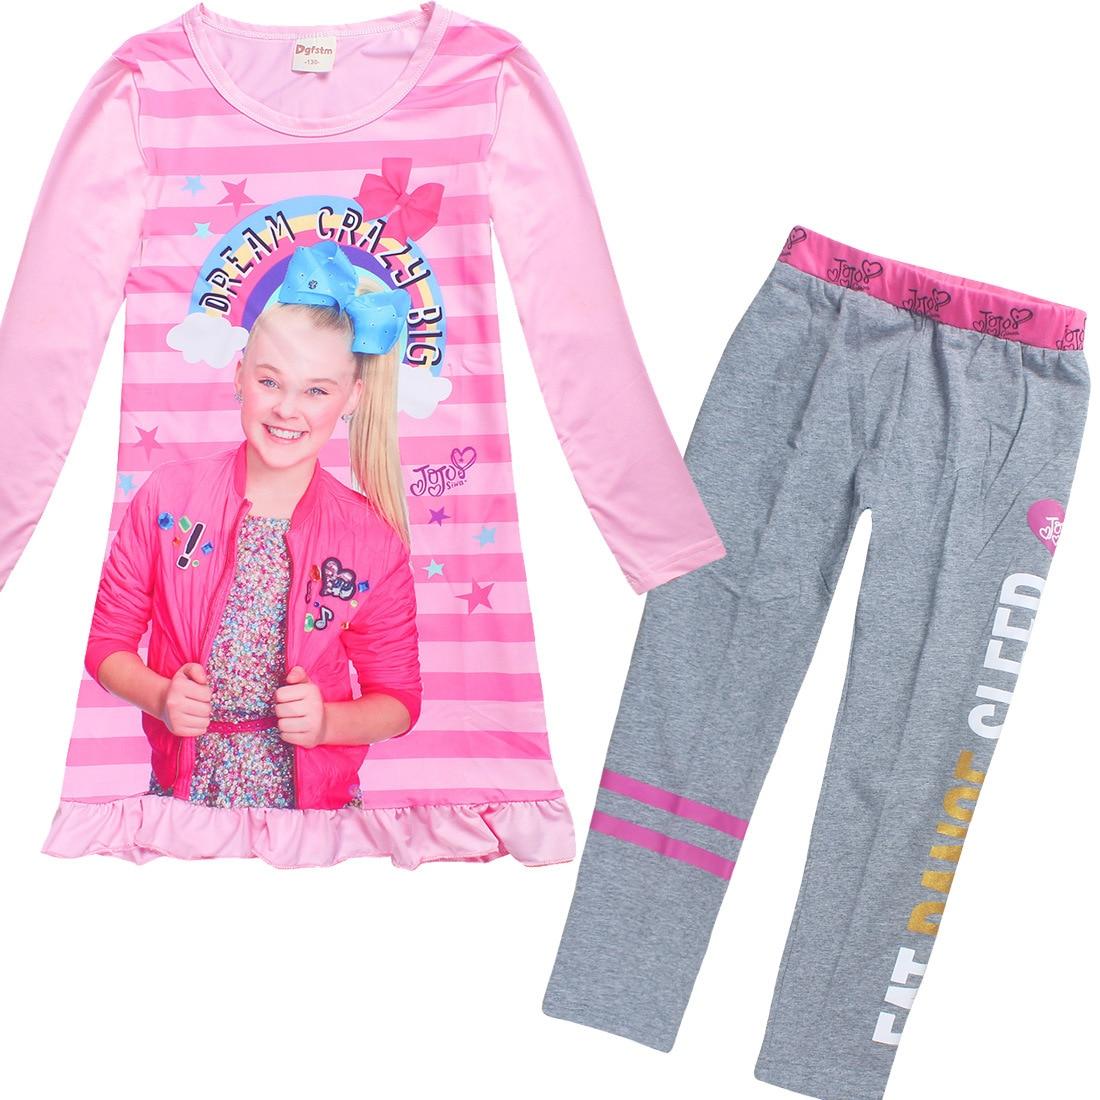 7ba1a01d1e US $8.24 25% OFF|2018 Pajamas for Girls Long Sleeve Dresses Cotton Pants  Jojo Siwa Clothing Set Childrens Fancy Dress Moana Trolls Teens Clothes-in  ...